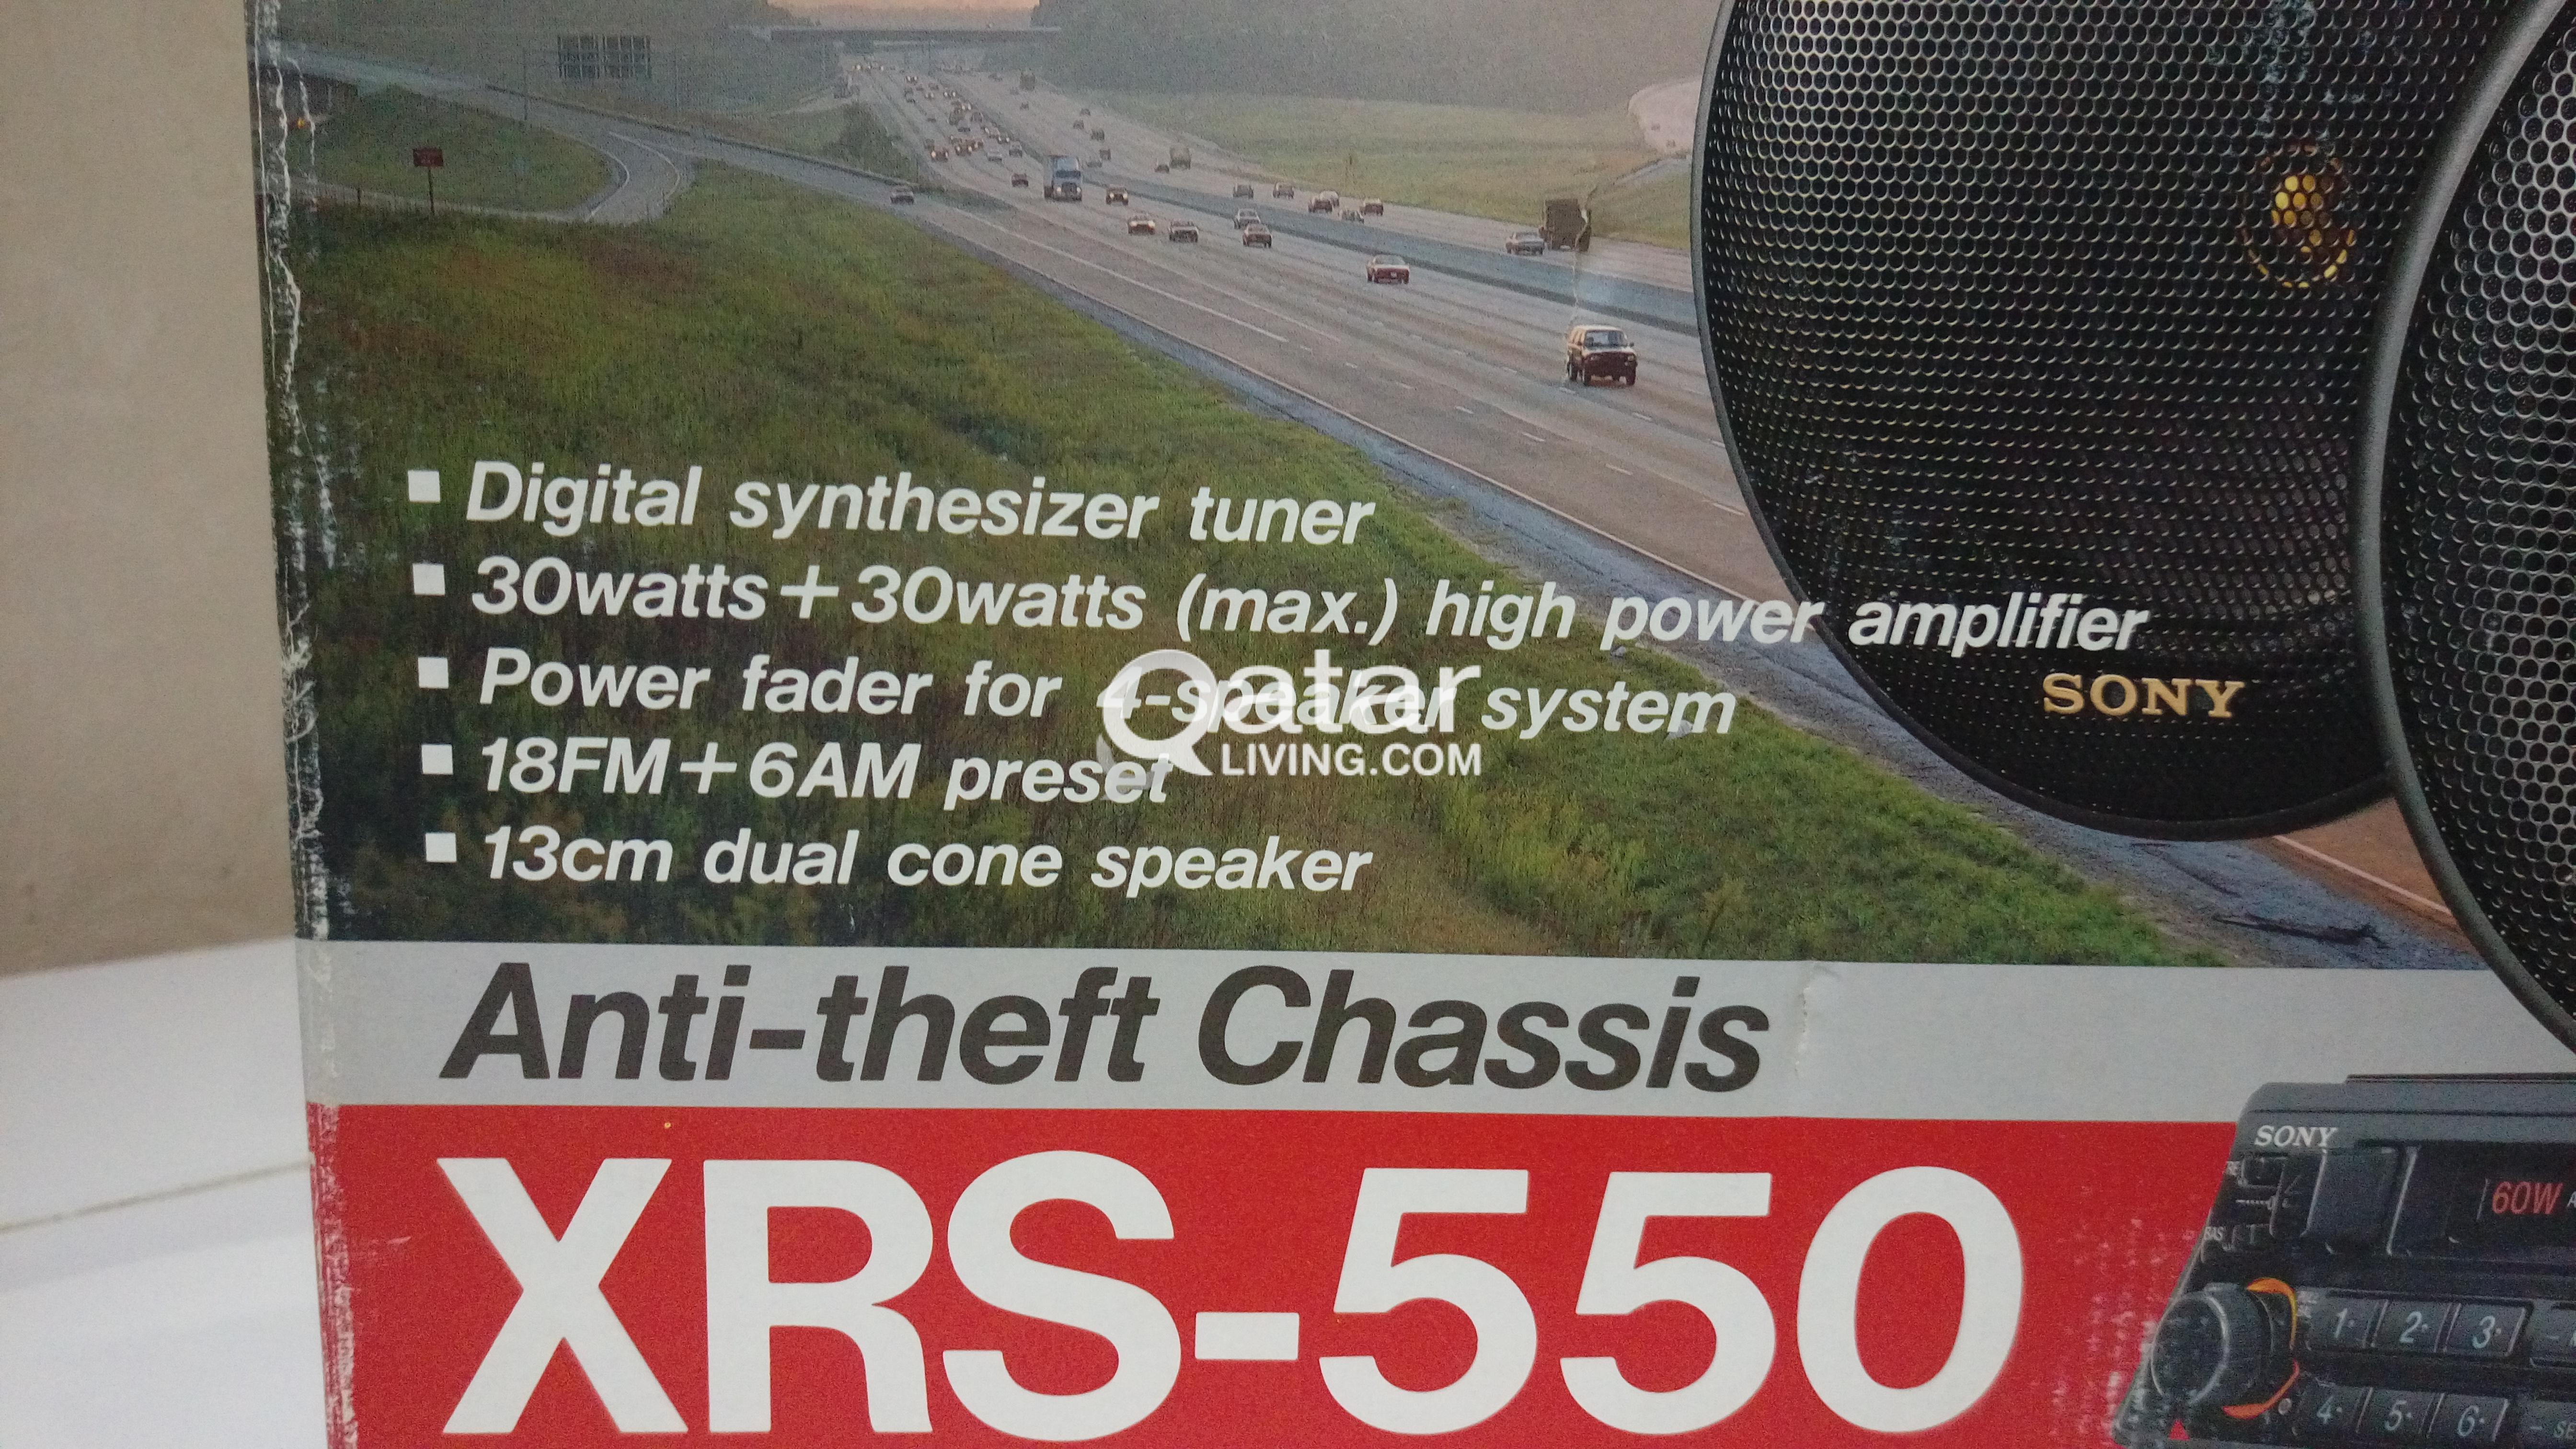 new Sony radio | Qatar Living